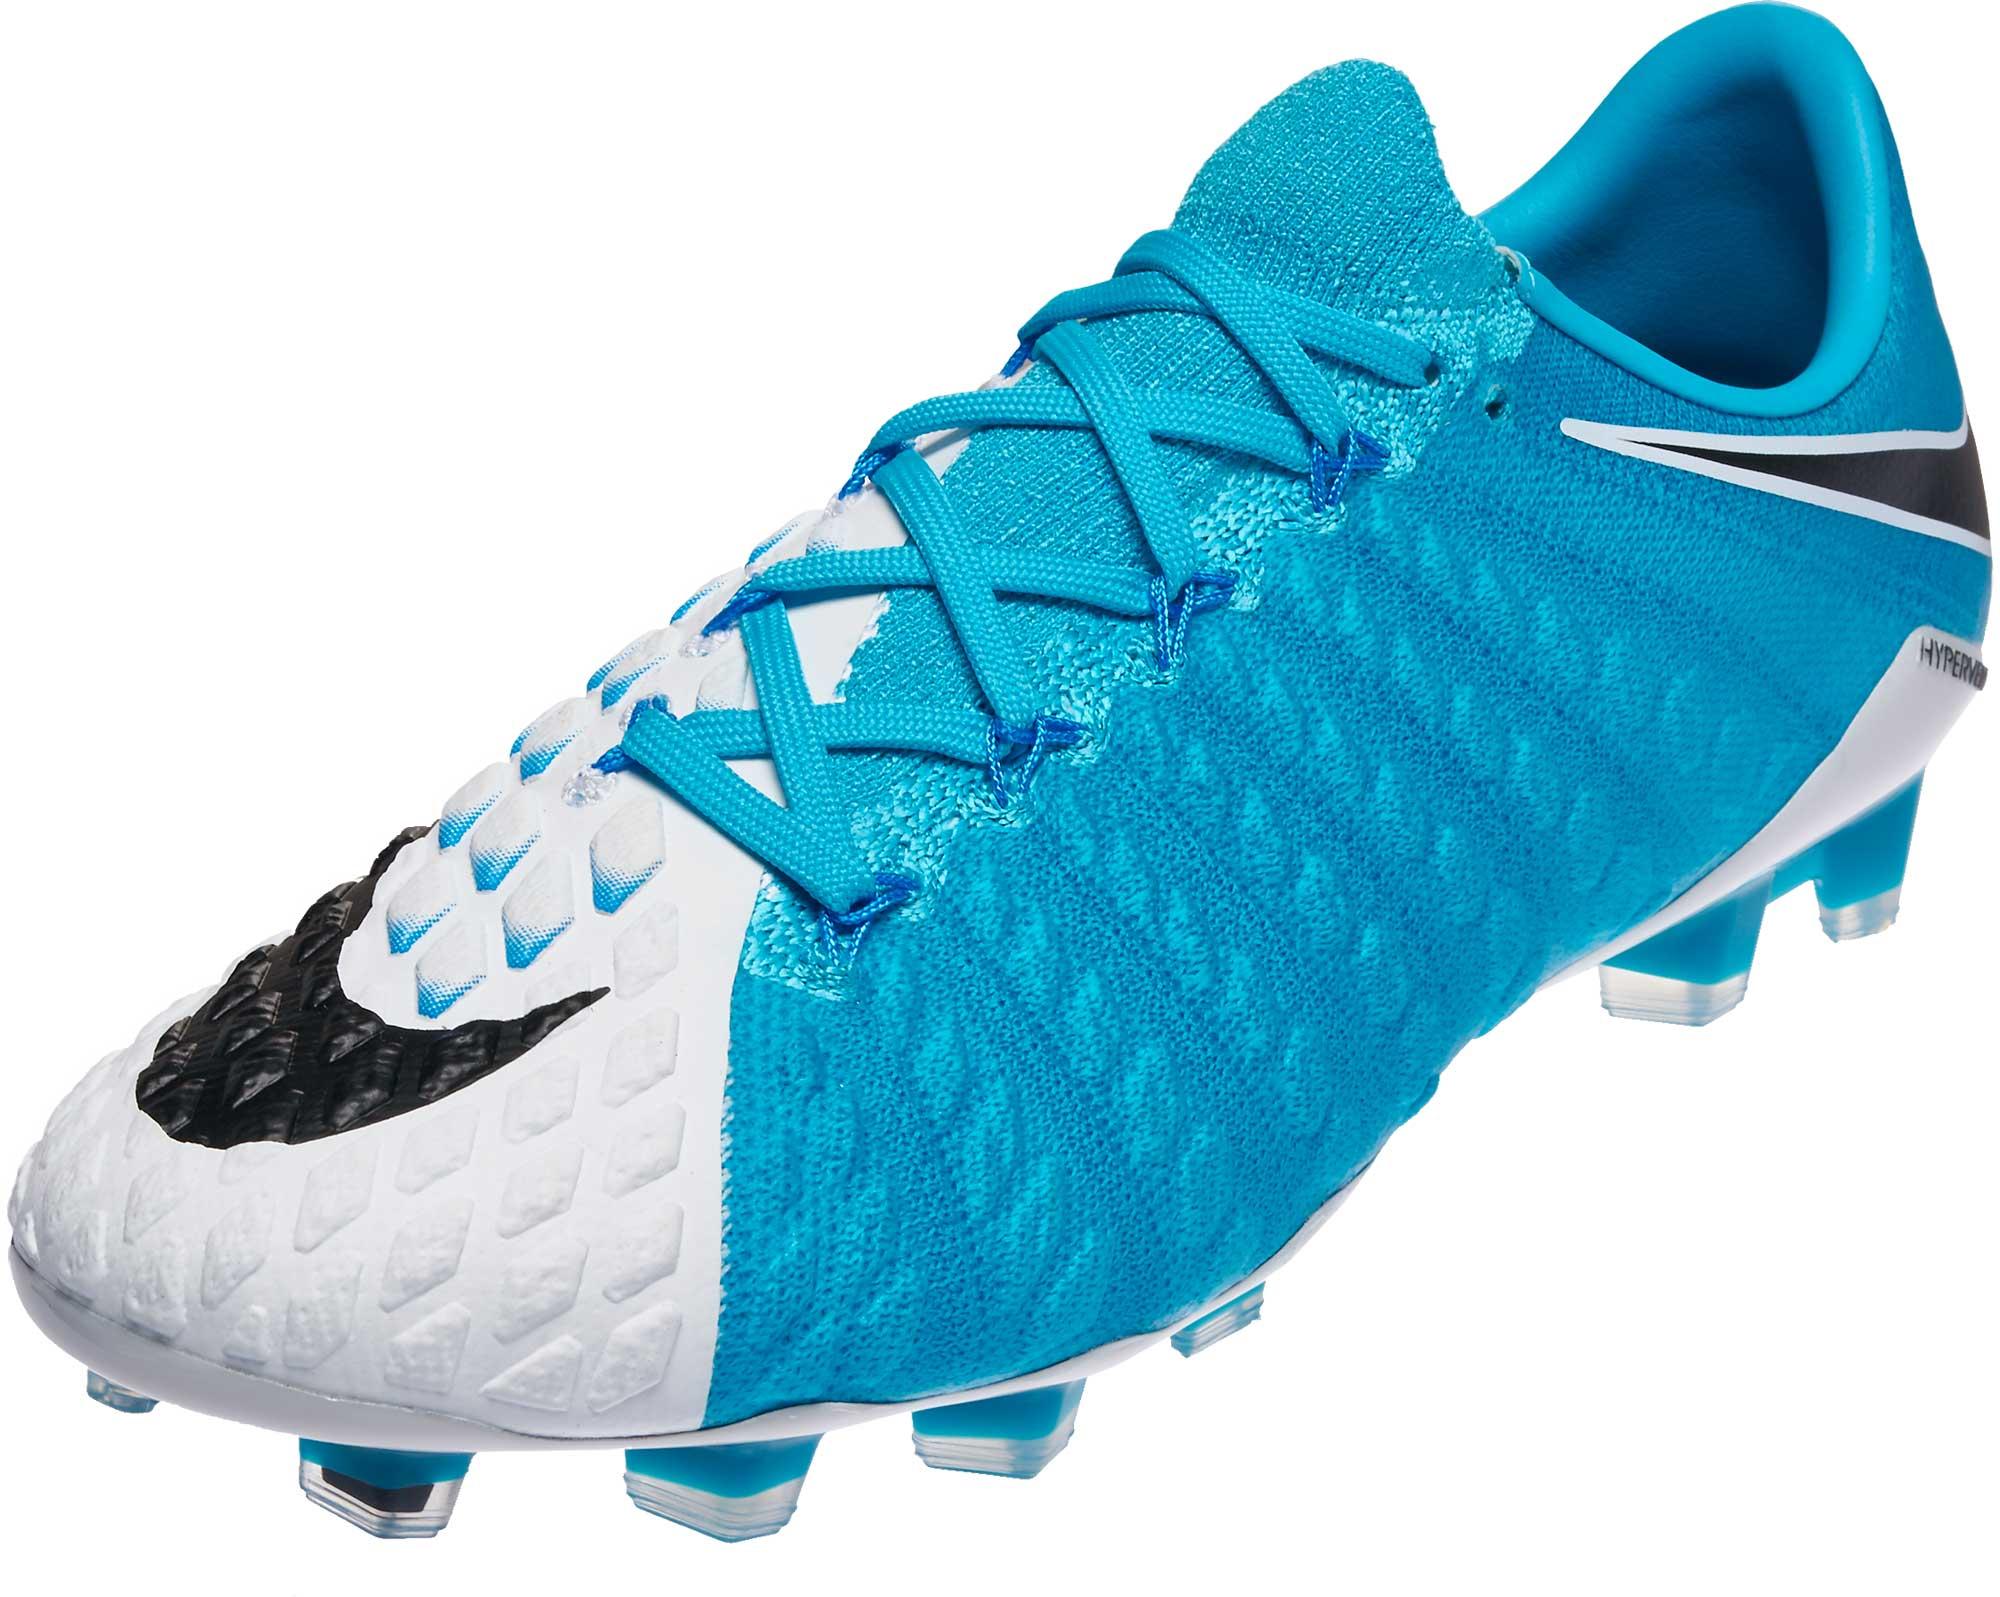 5e1f8232f07 Nike Hypervenom Phantom III FG - White Soccer Cleats